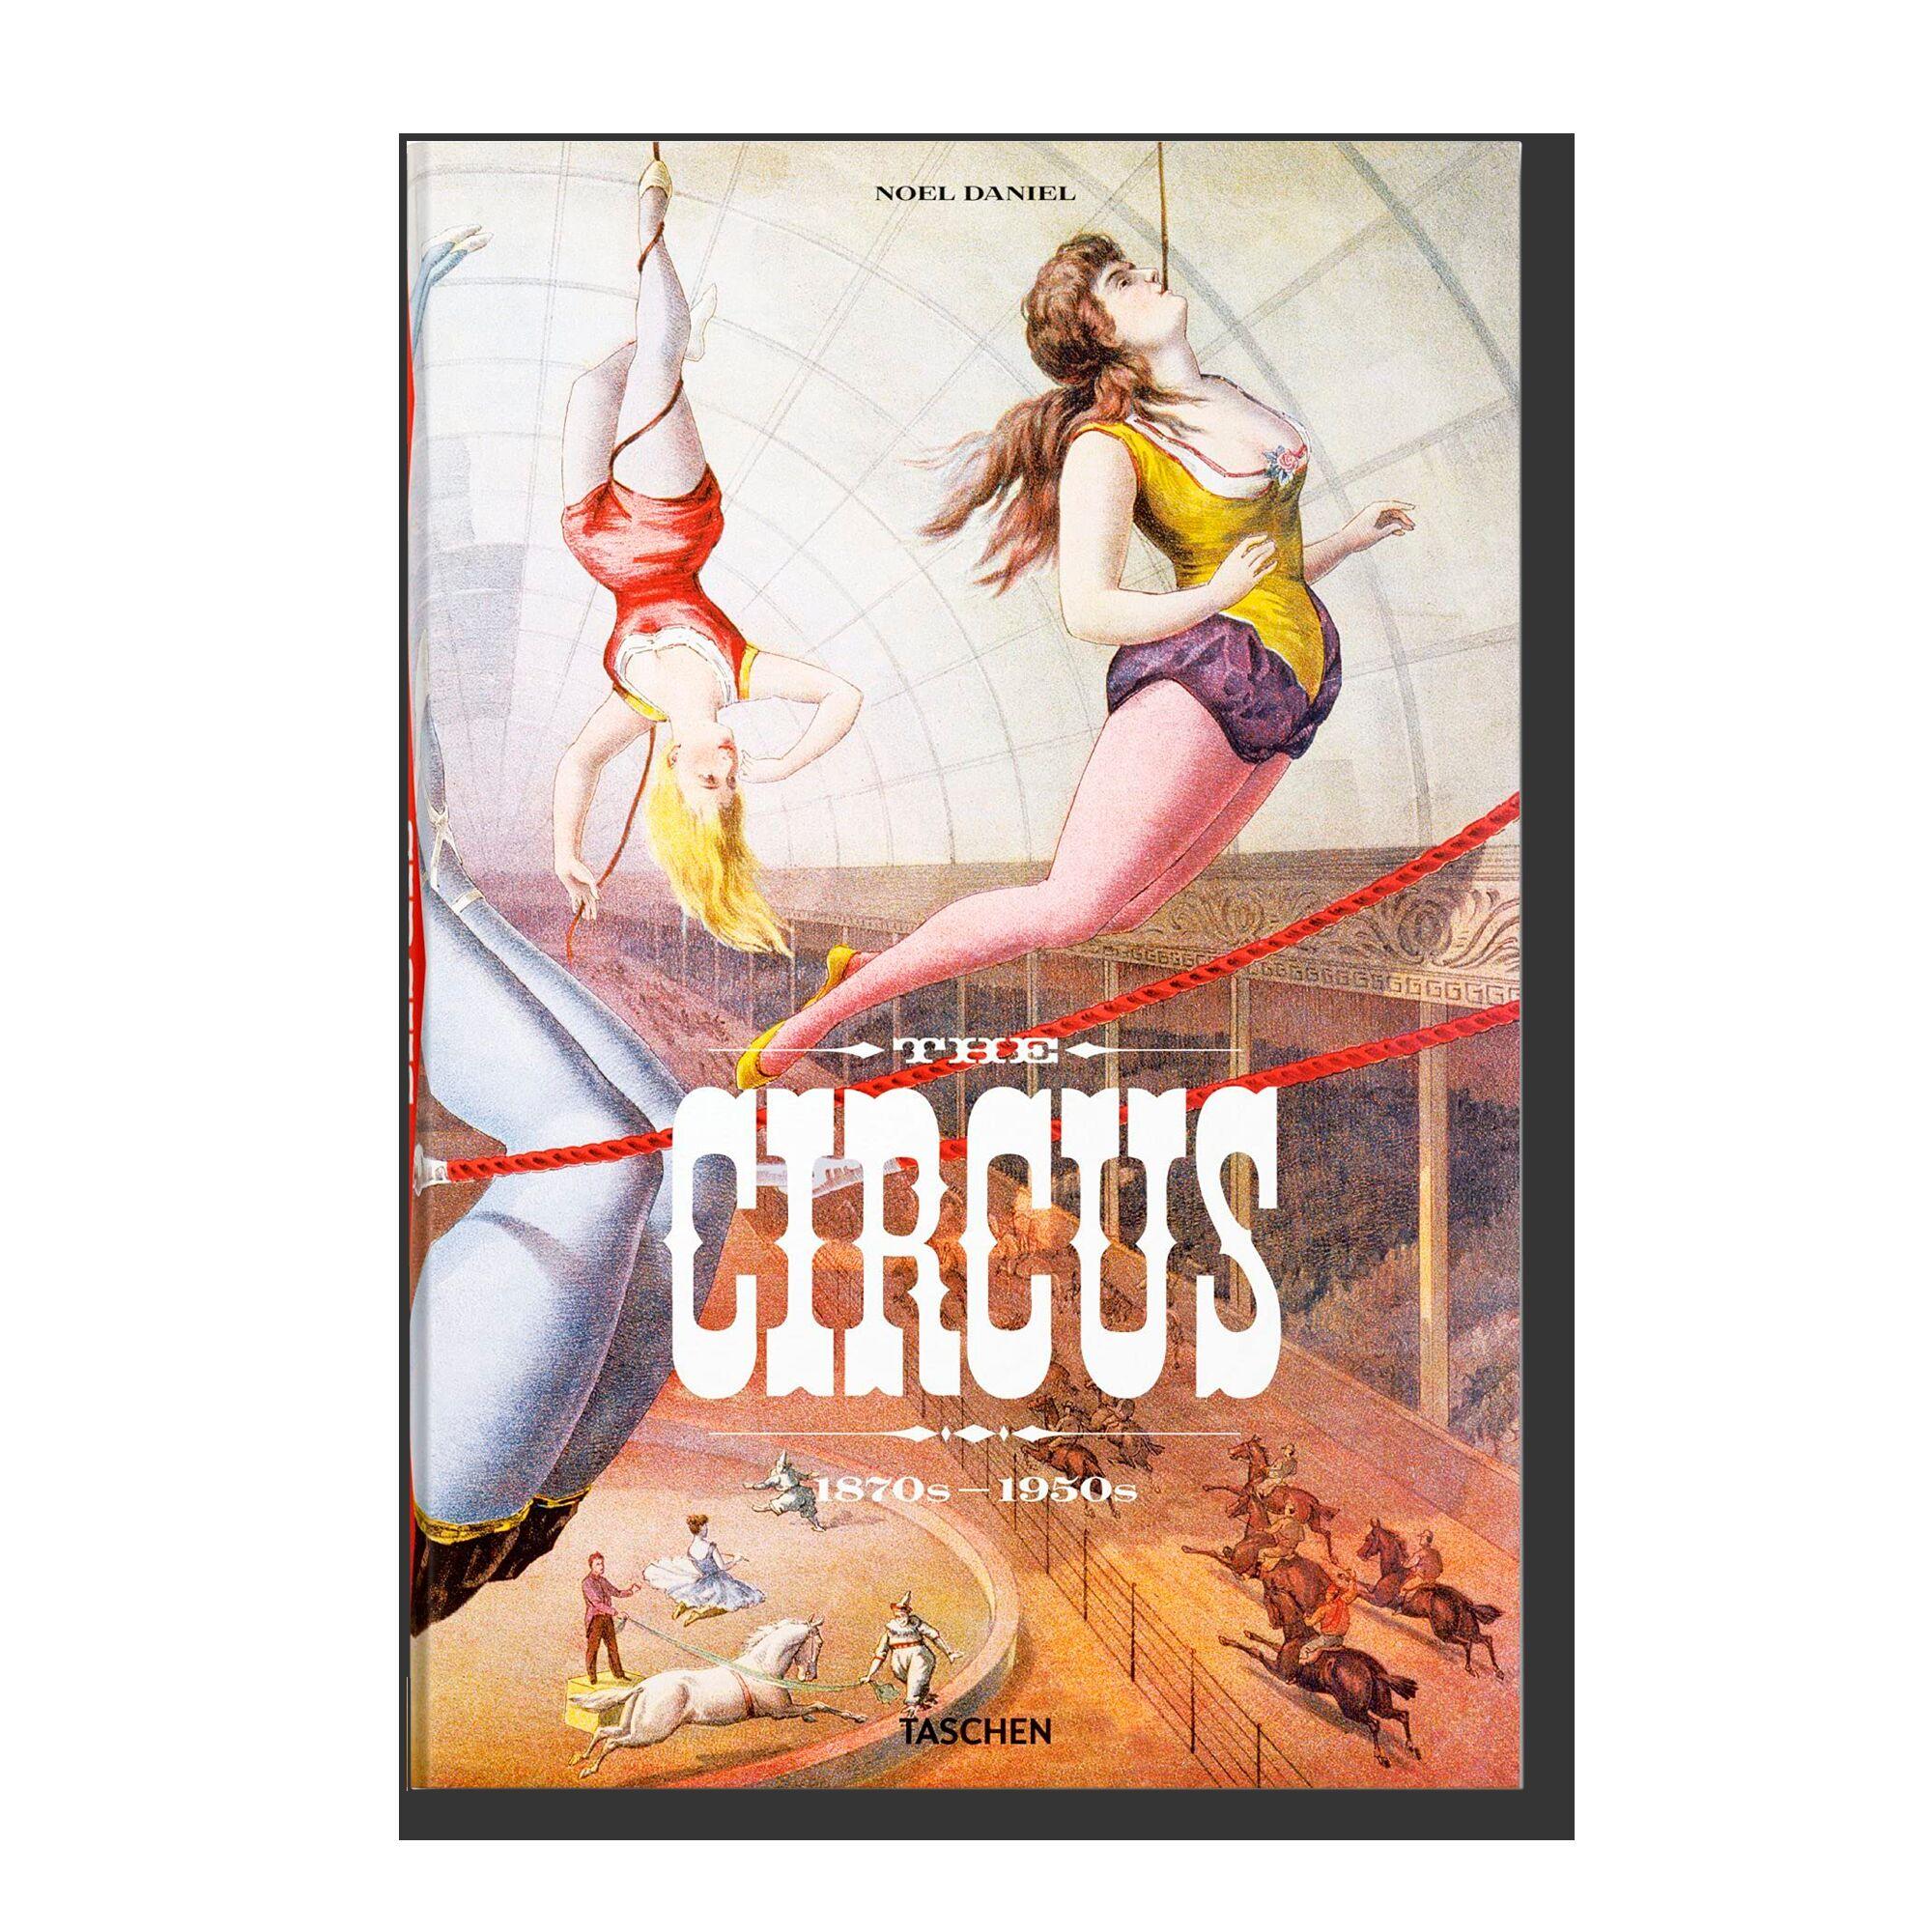 The Circus. 1870s–1950s (Bibliotheca Universalis)